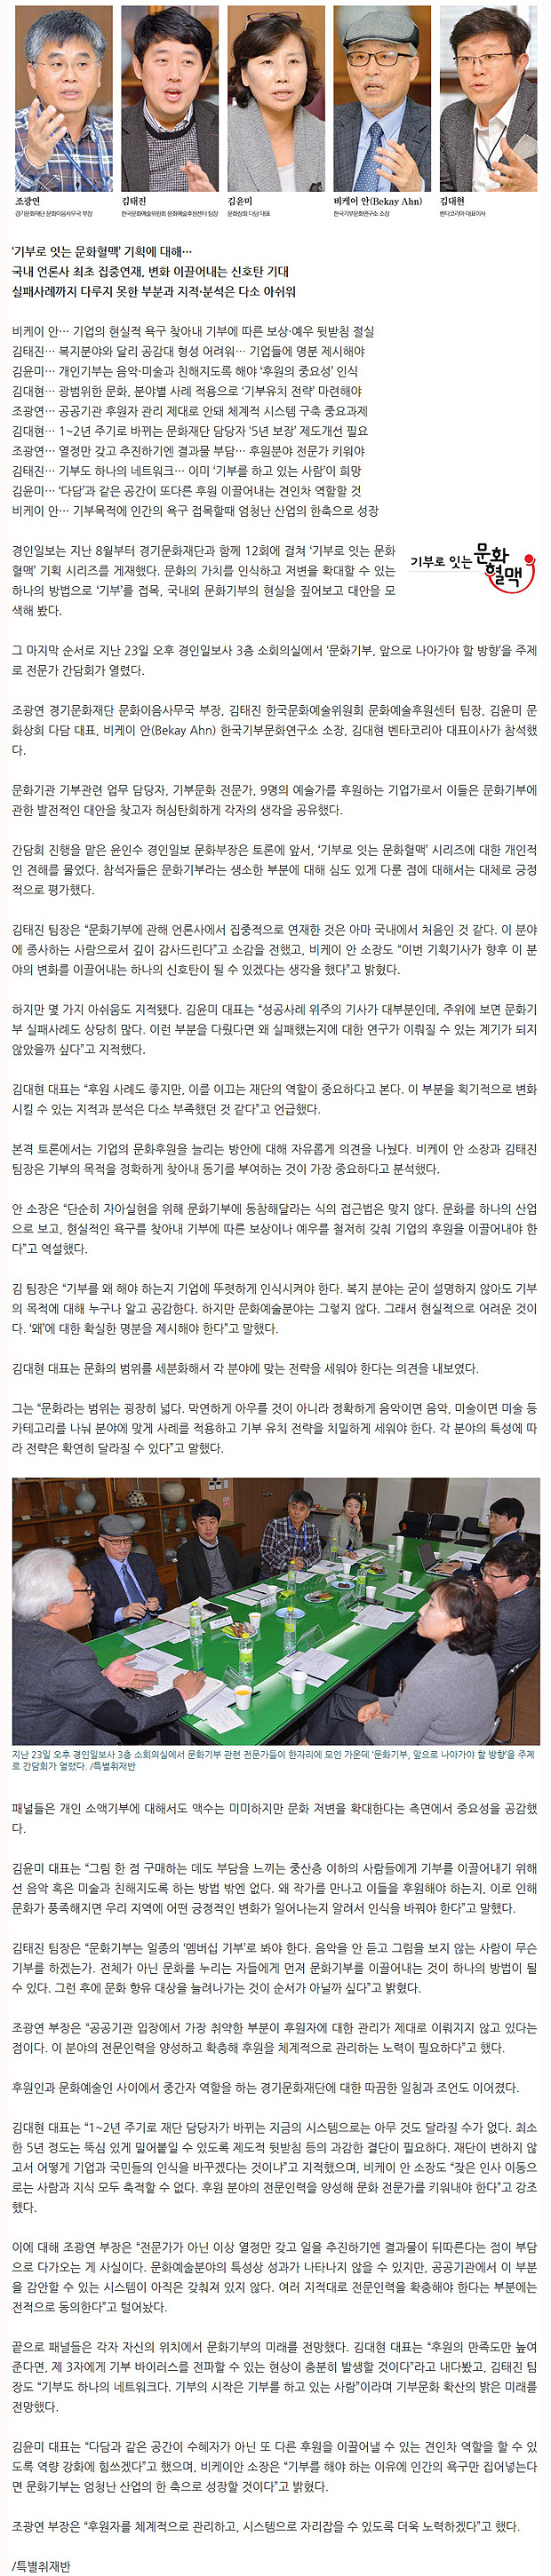 kyeongin_com_20151126_085942.jpg